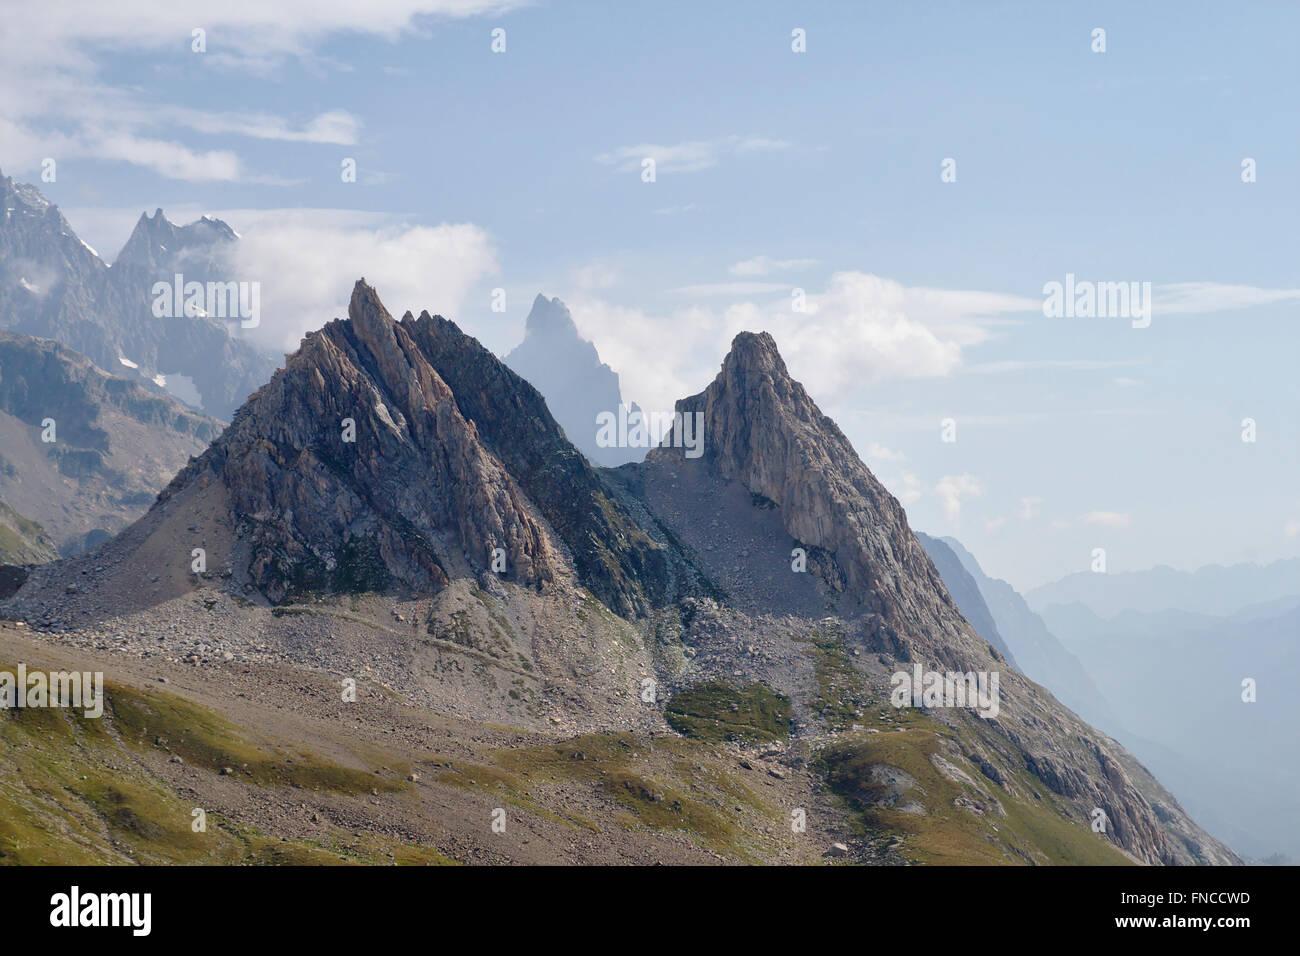 Les Pyramides Calcaires in Vallon de la Lex Blanche (Val Veny), with Aiguille Noire de Peuterey in the back, Italy - Stock Image